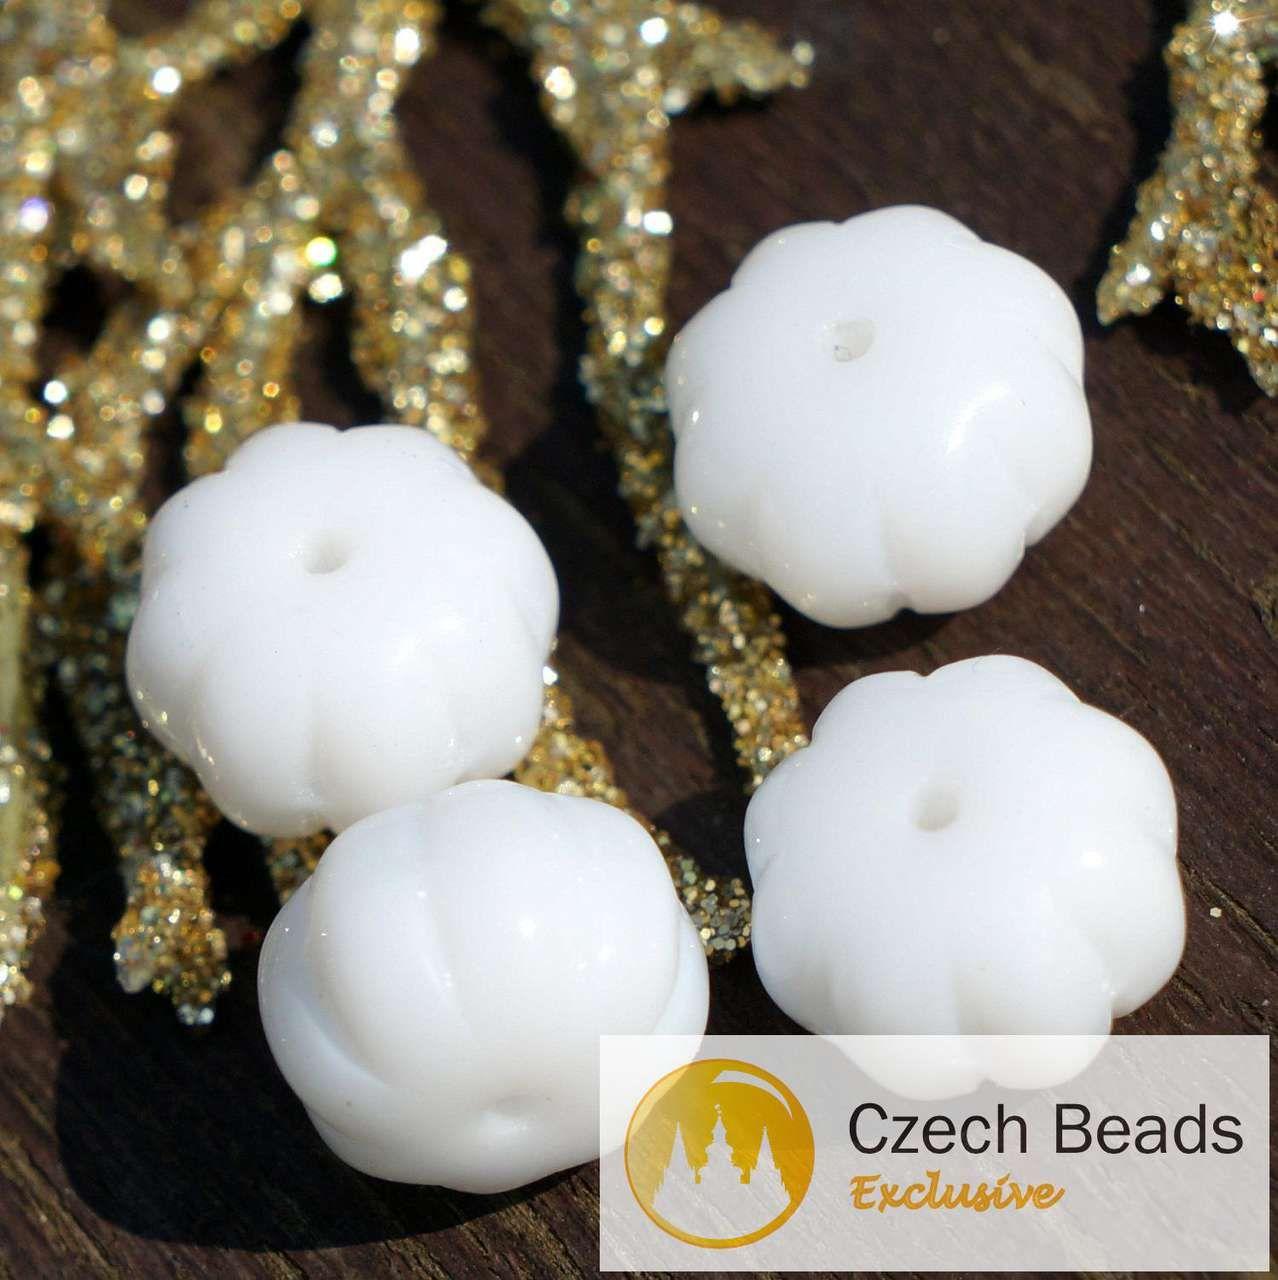 ✔ What's Hot Today: Opaque White Czech Glass Squashed Melon Beads Fruit Pumpkin 8mm x 11mm 16pcs https://czechbeadsexclusive.com/product/opaque-white-squashed-melon-beads-czech-glass-melon-beads-glass-fruit-beads-white-melon-glass-beads-pumpkin-czech-melon-beads-10mm-8pc/?utm_source=PN&utm_medium=czechbeads&utm_campaign=SNAP #CzechBeadsExclusive #czechbeads #glassbeads #bead #beaded #beading #beadedjewelry #handmade